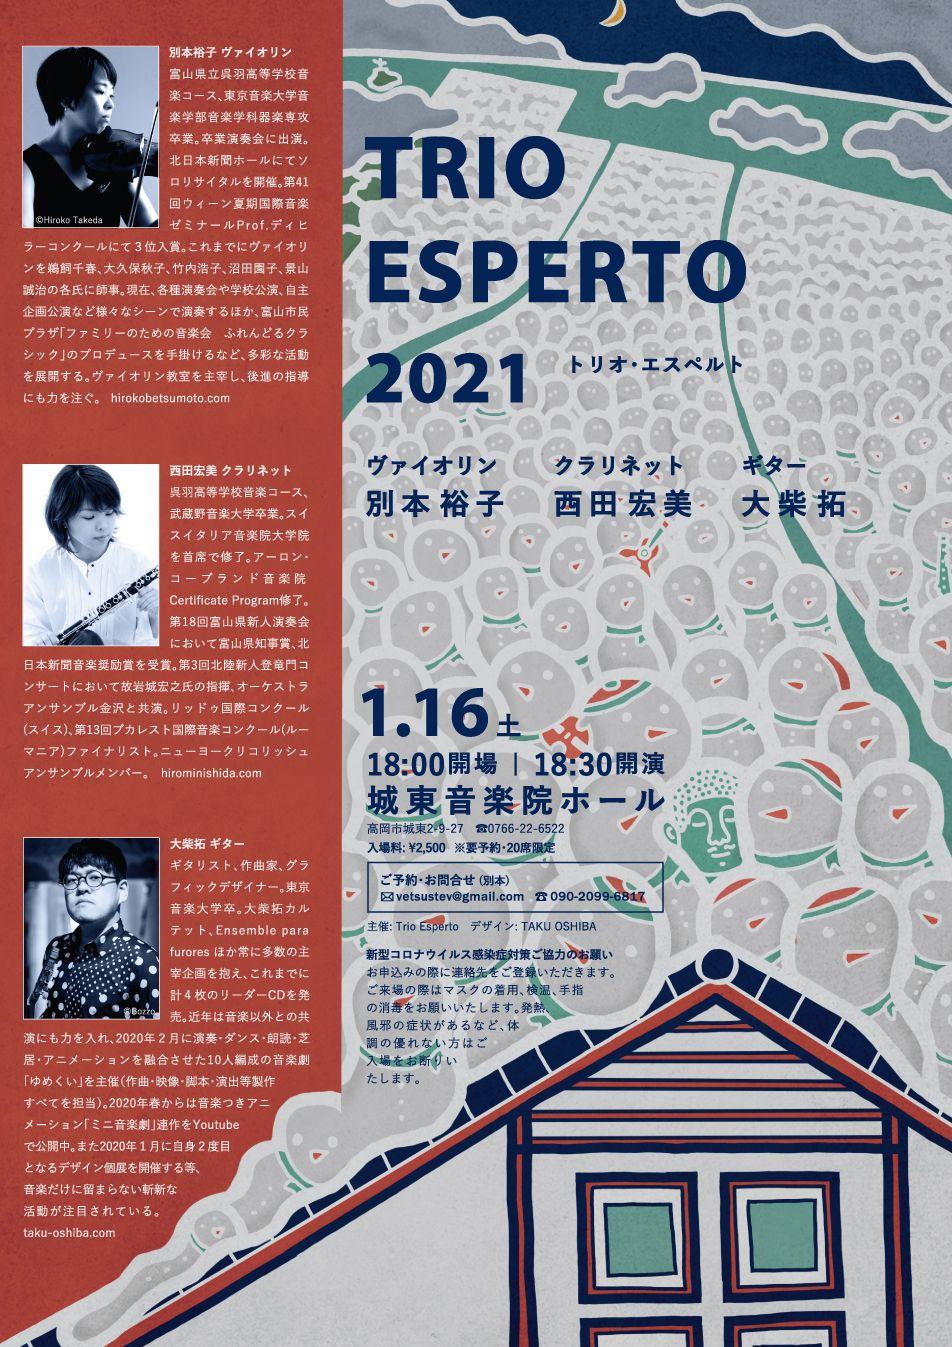 TRIO ESPERTO 2021 開催